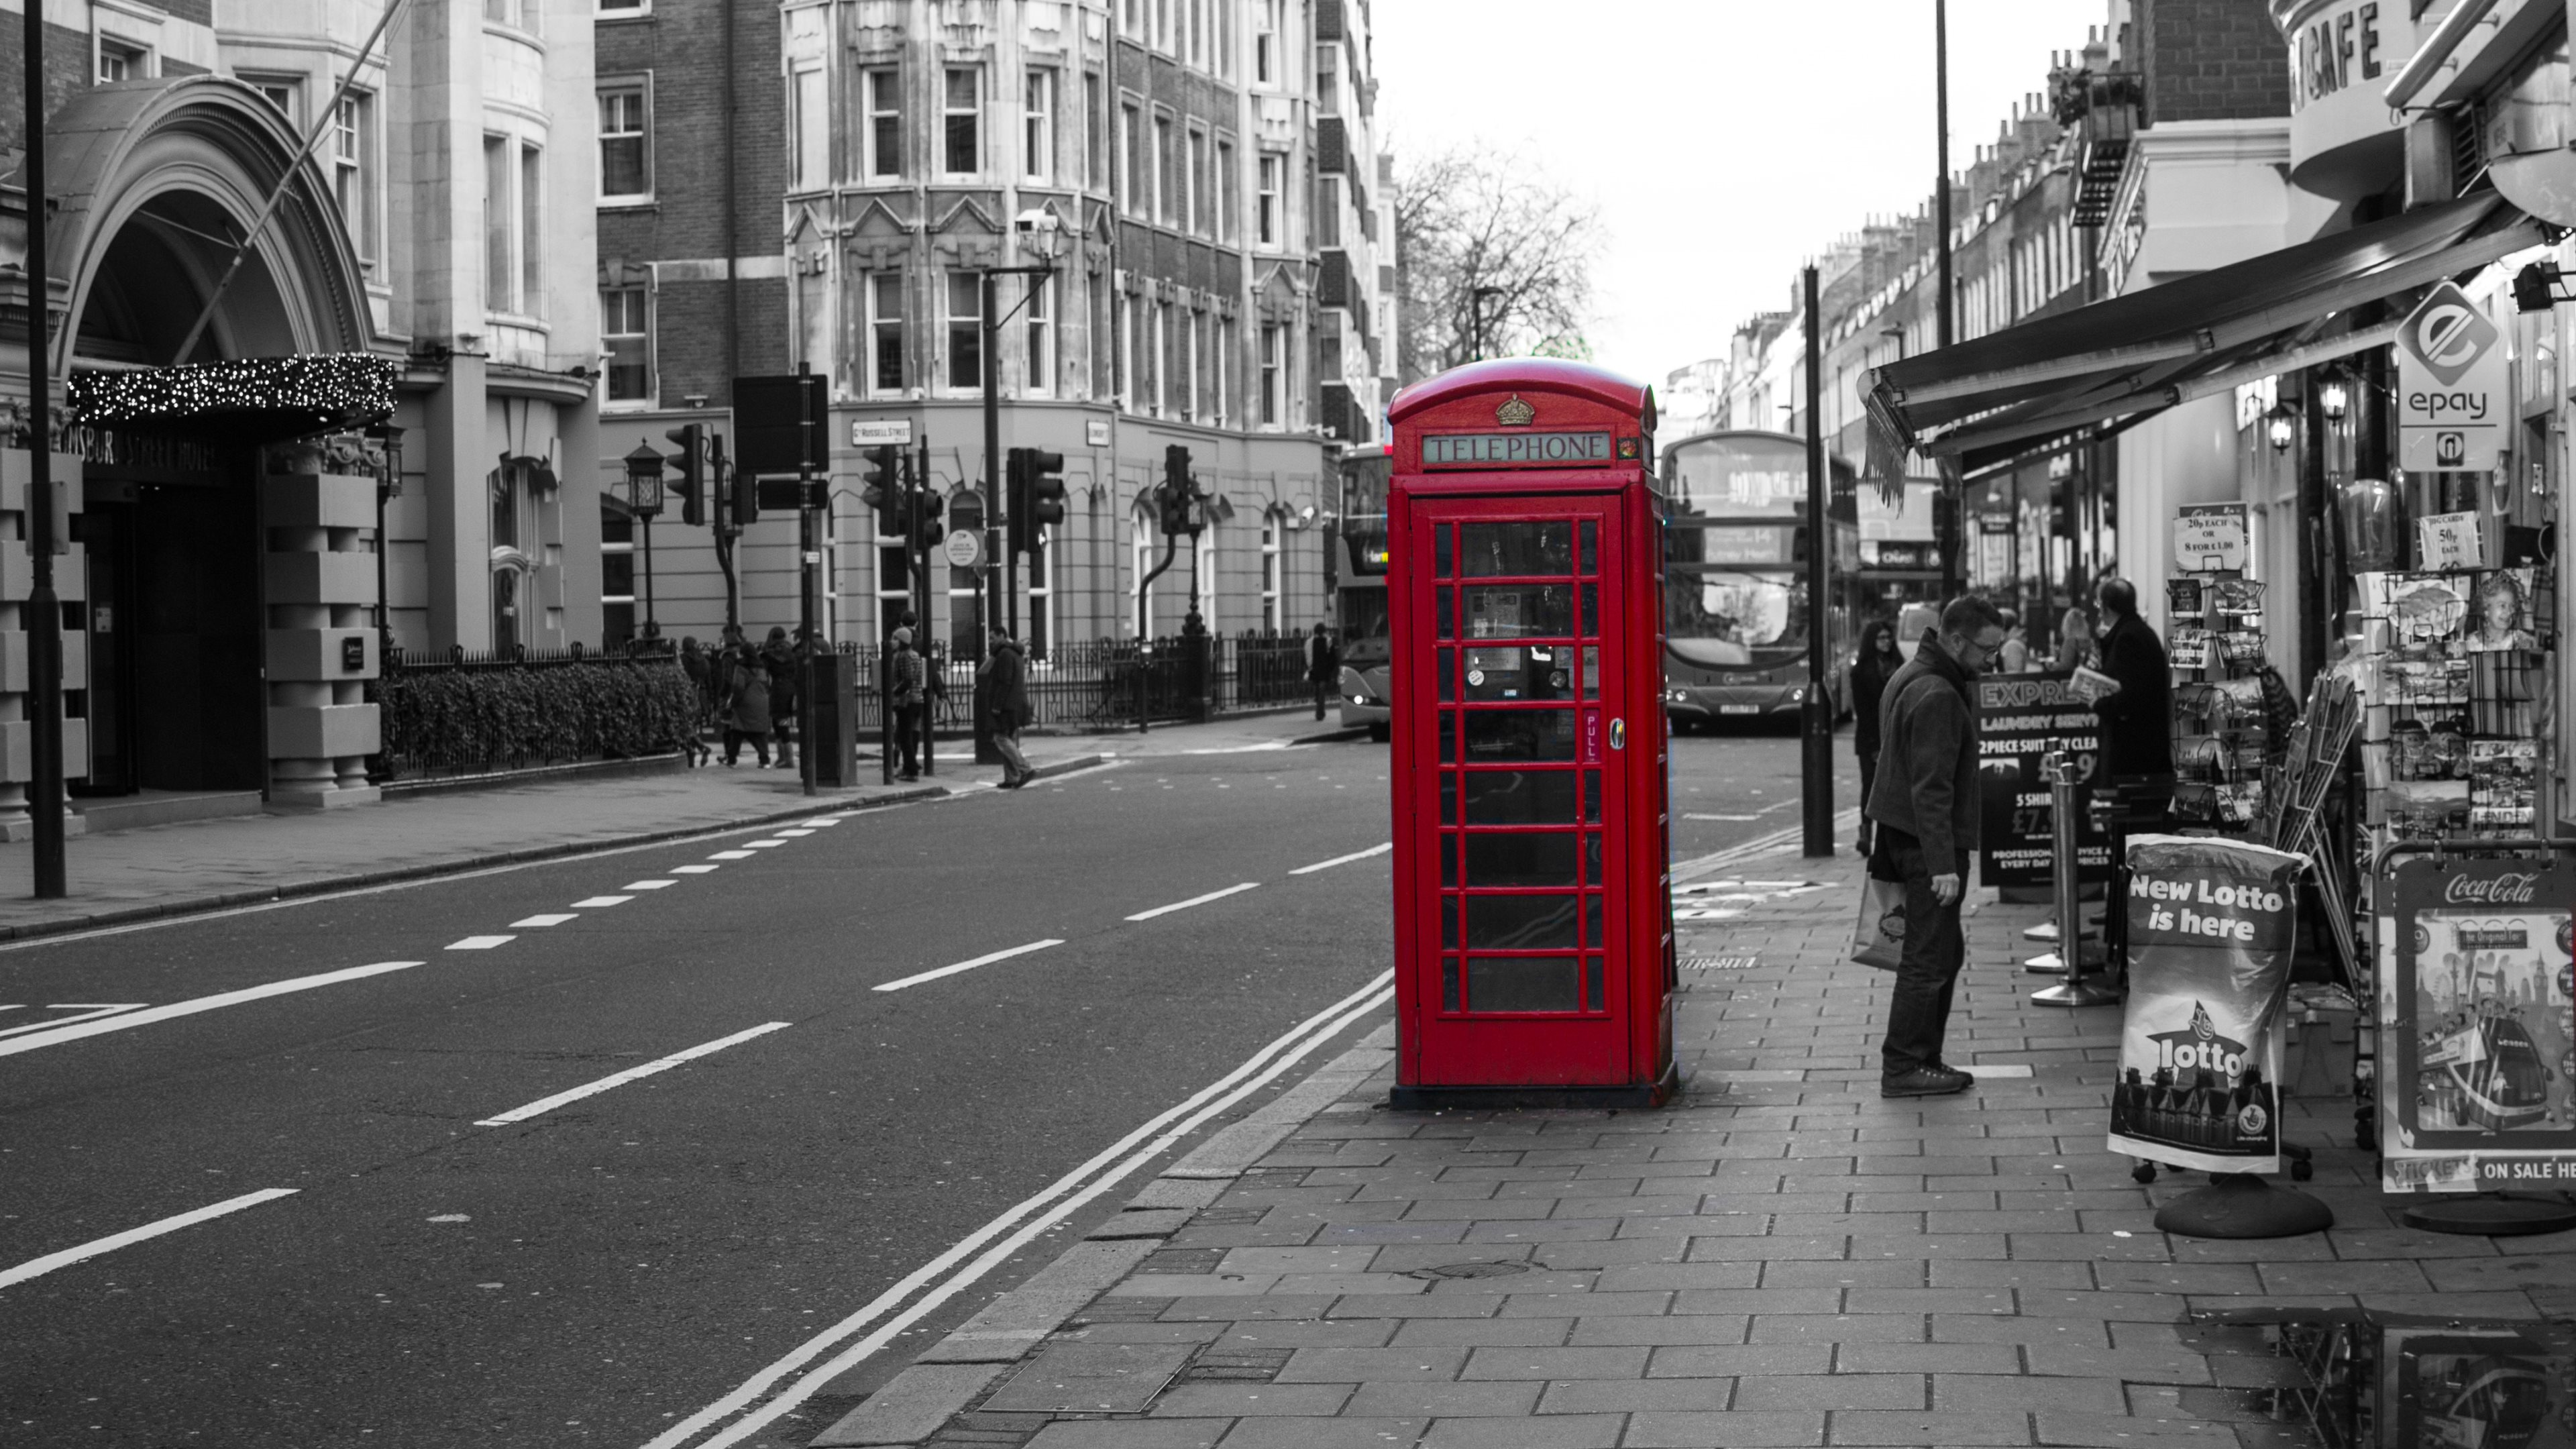 Hd wallpaper london - Ultra Hd 4k 3840x2160